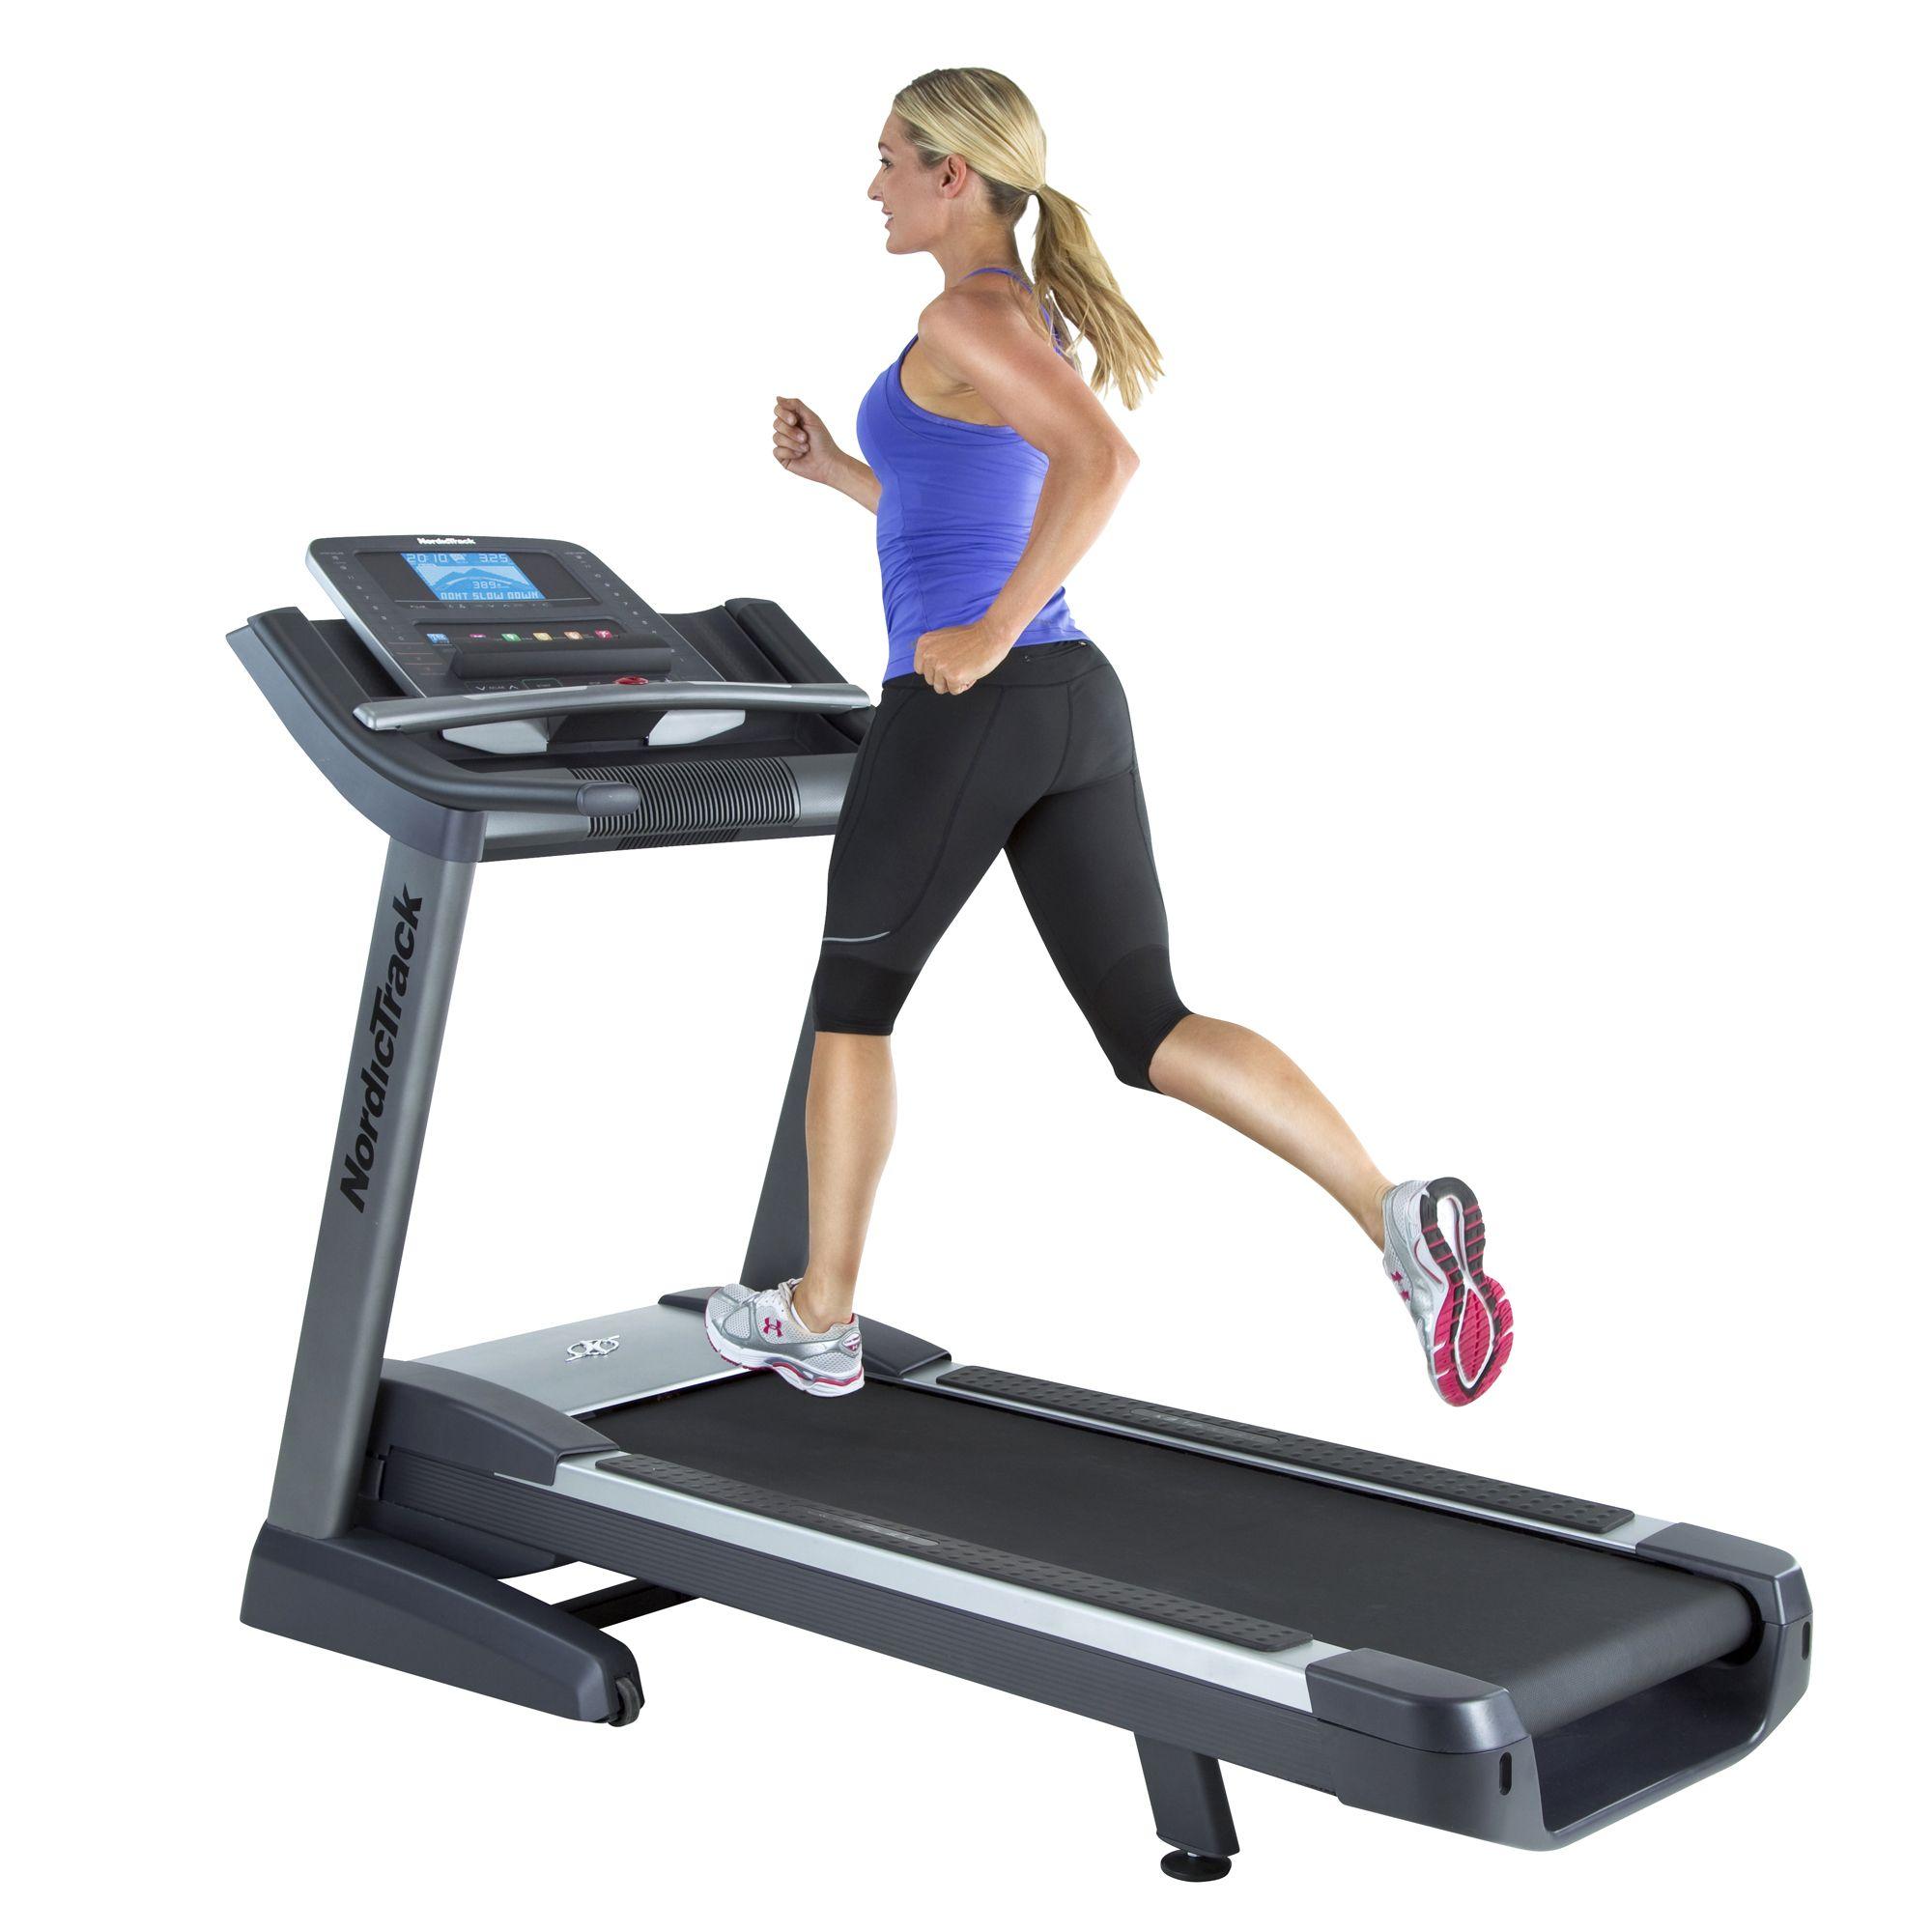 NordicTrack C 1500 Treadmill